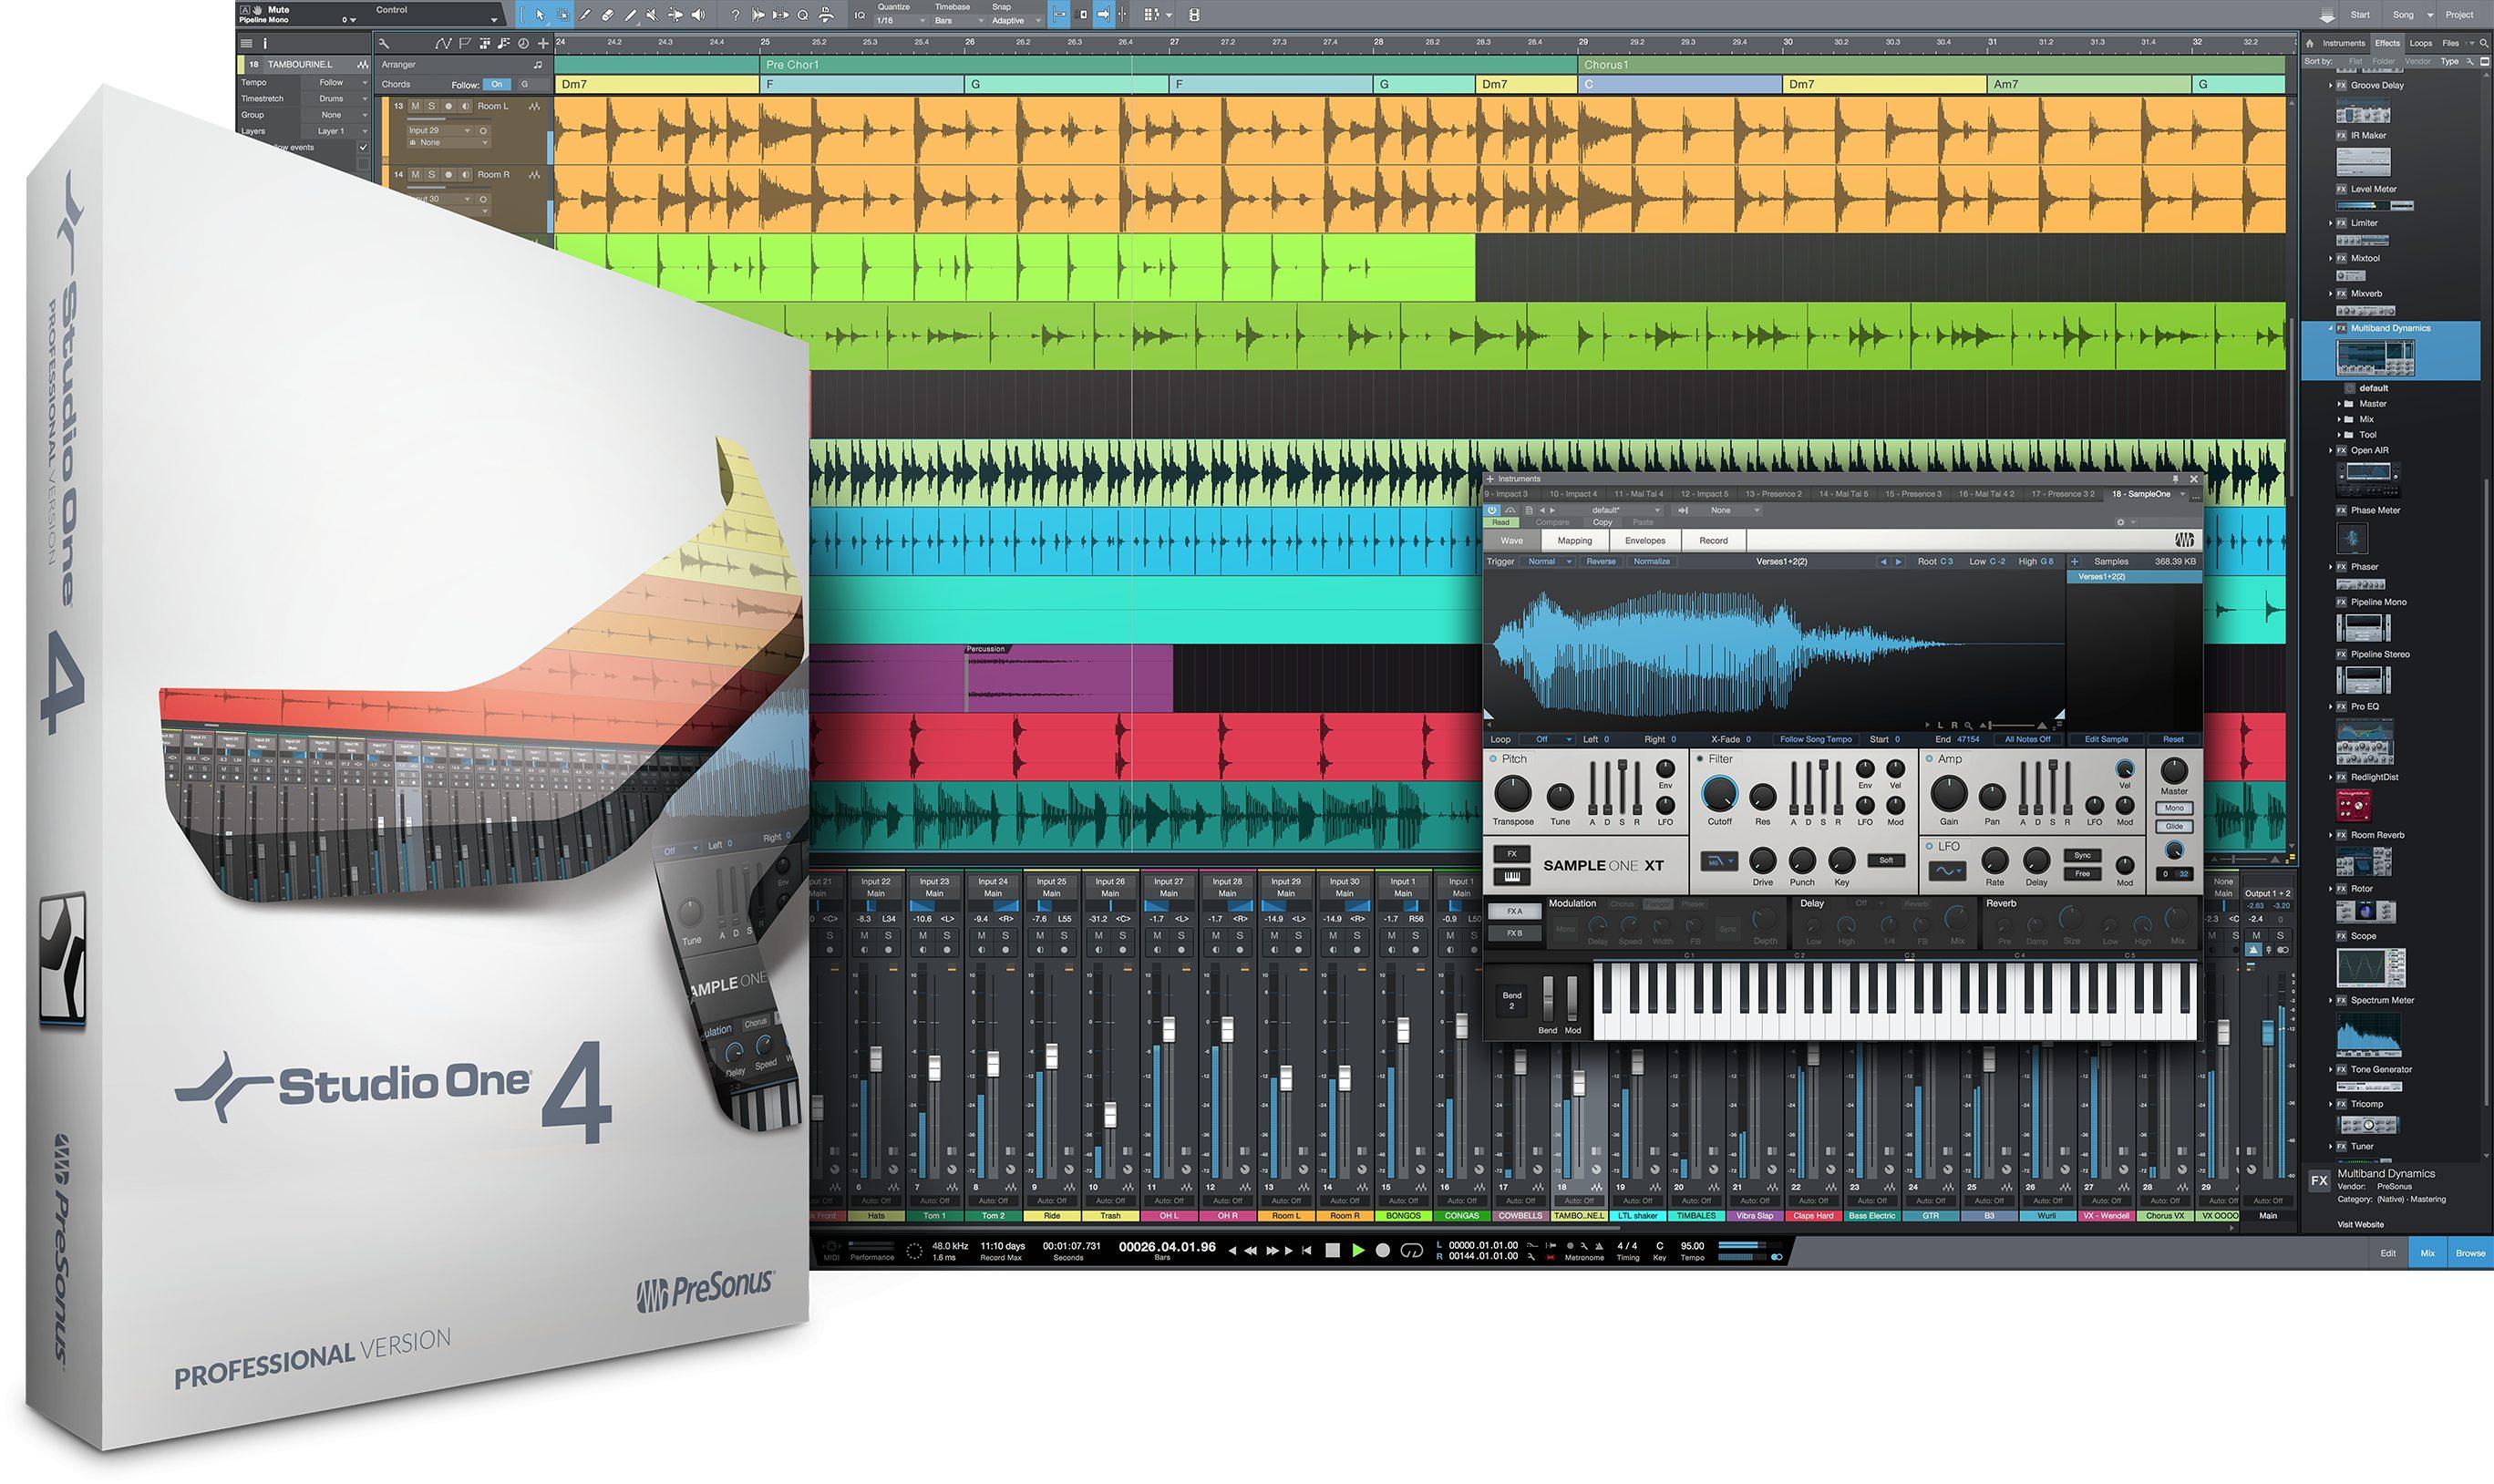 PreSonus Studio One 4 Professional Recording Suite Software $199.98 - Amazon digital code